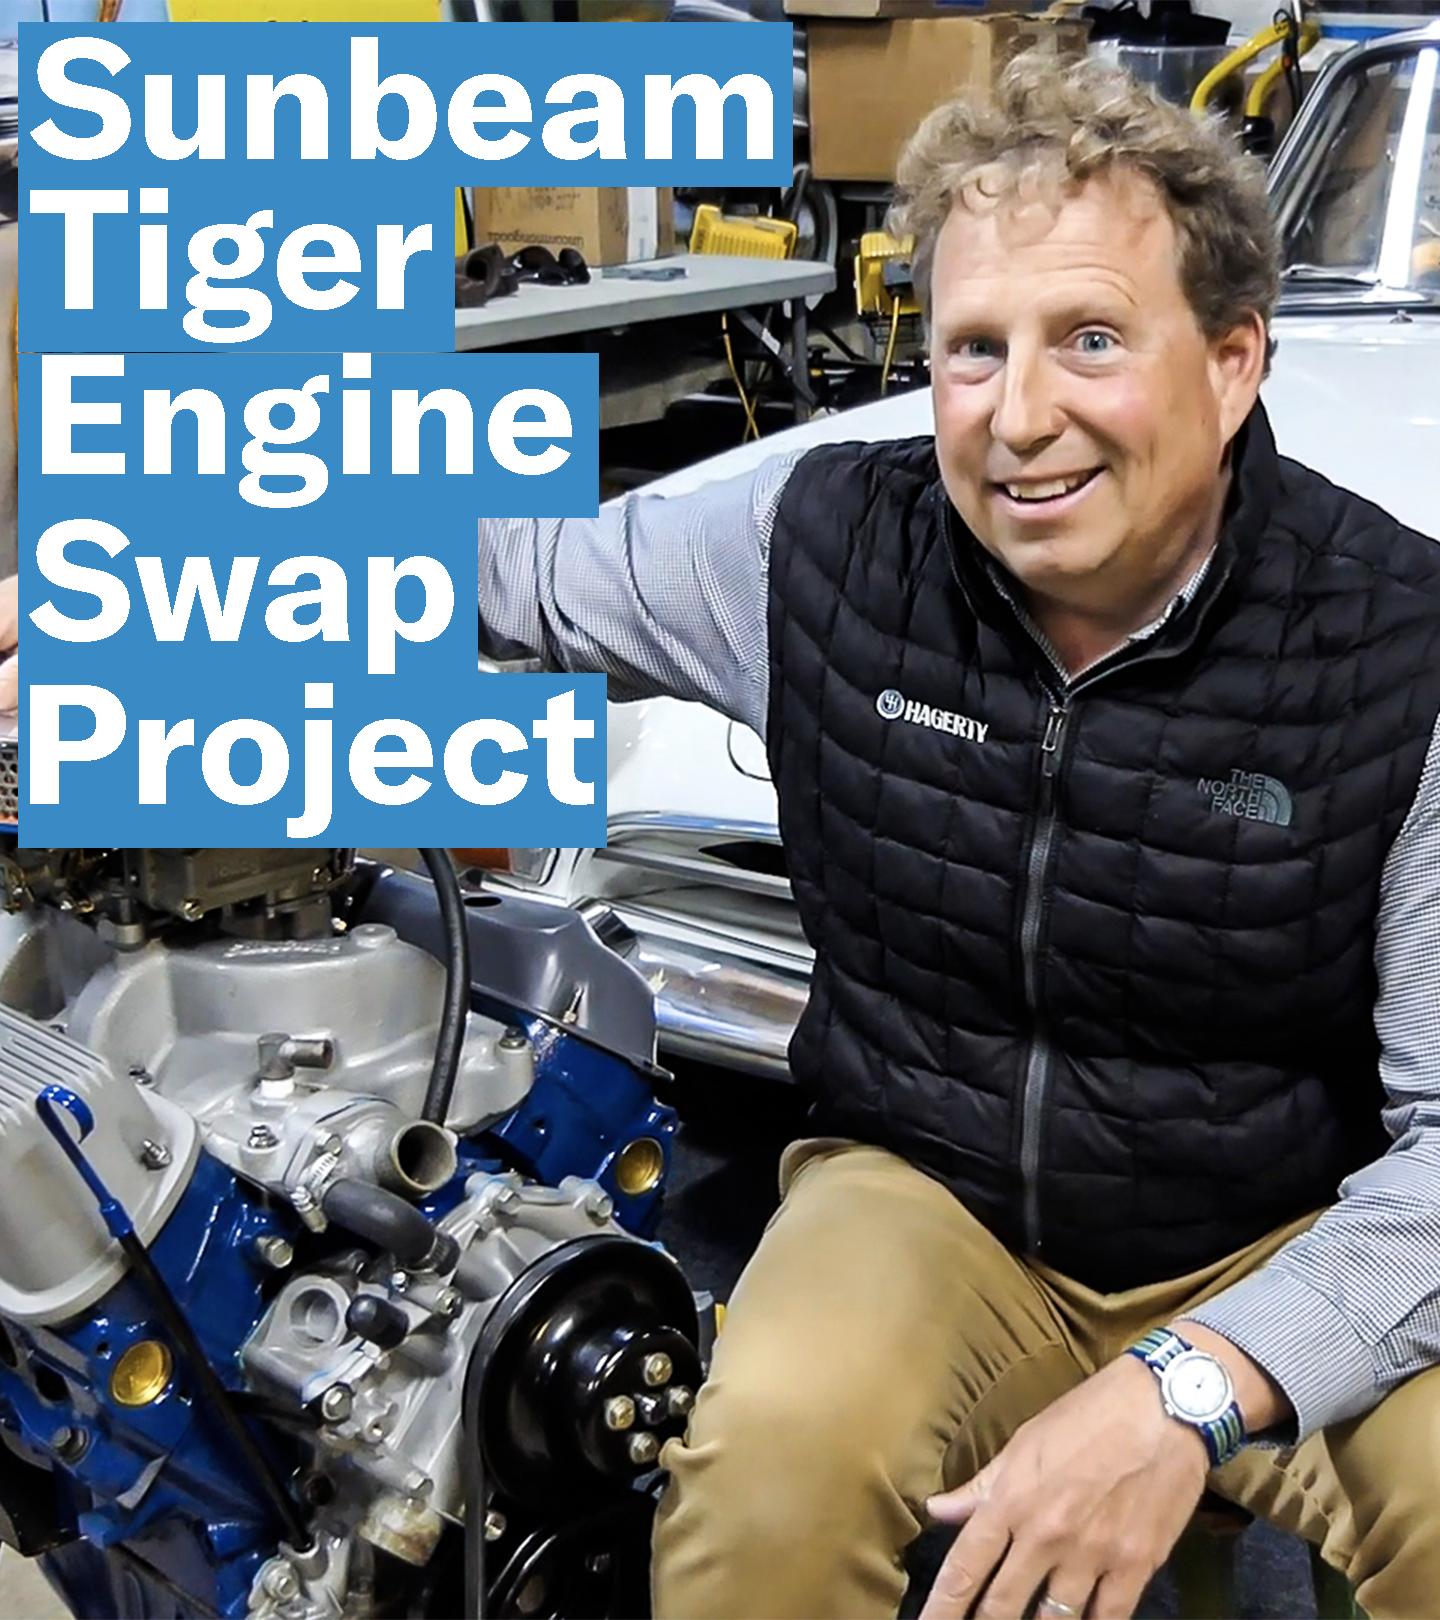 Sunbeam Tiger Engine Swap Project